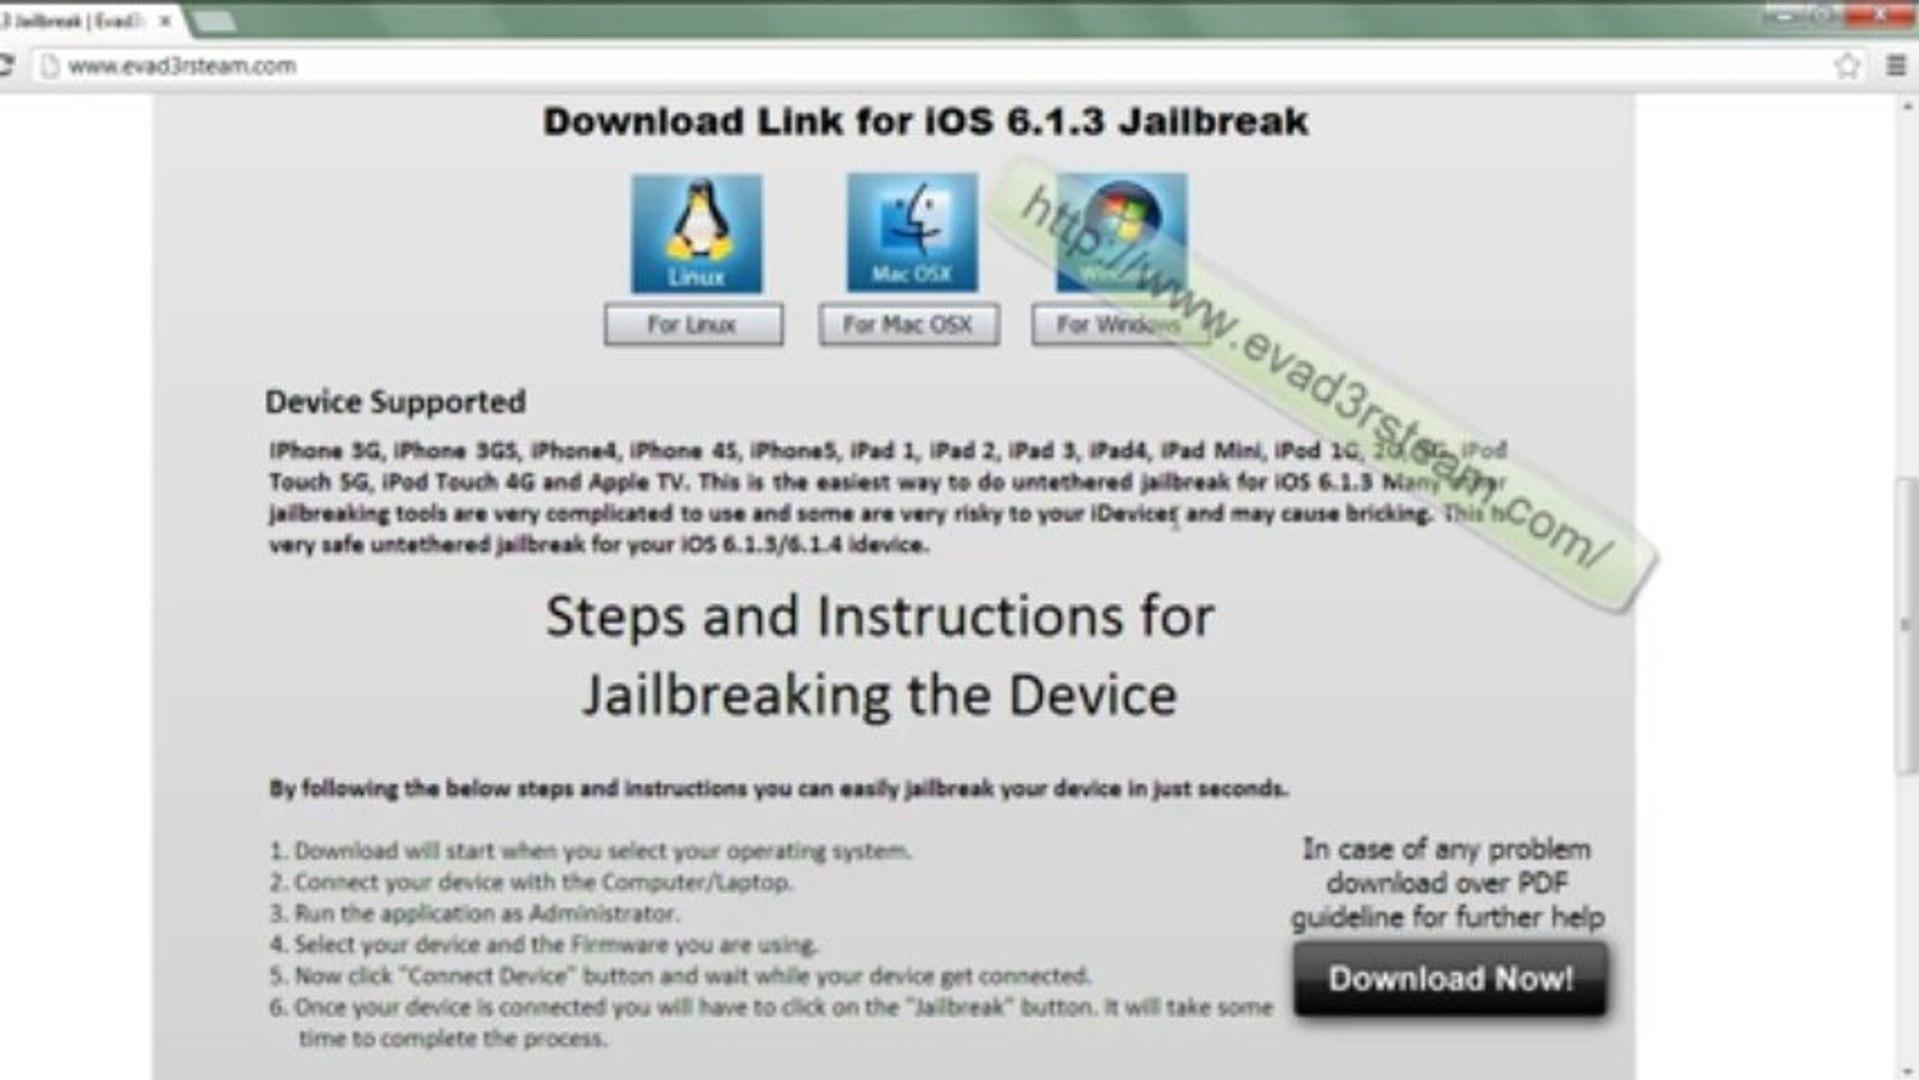 Download jailbreak tools, ios firmwares, and more.